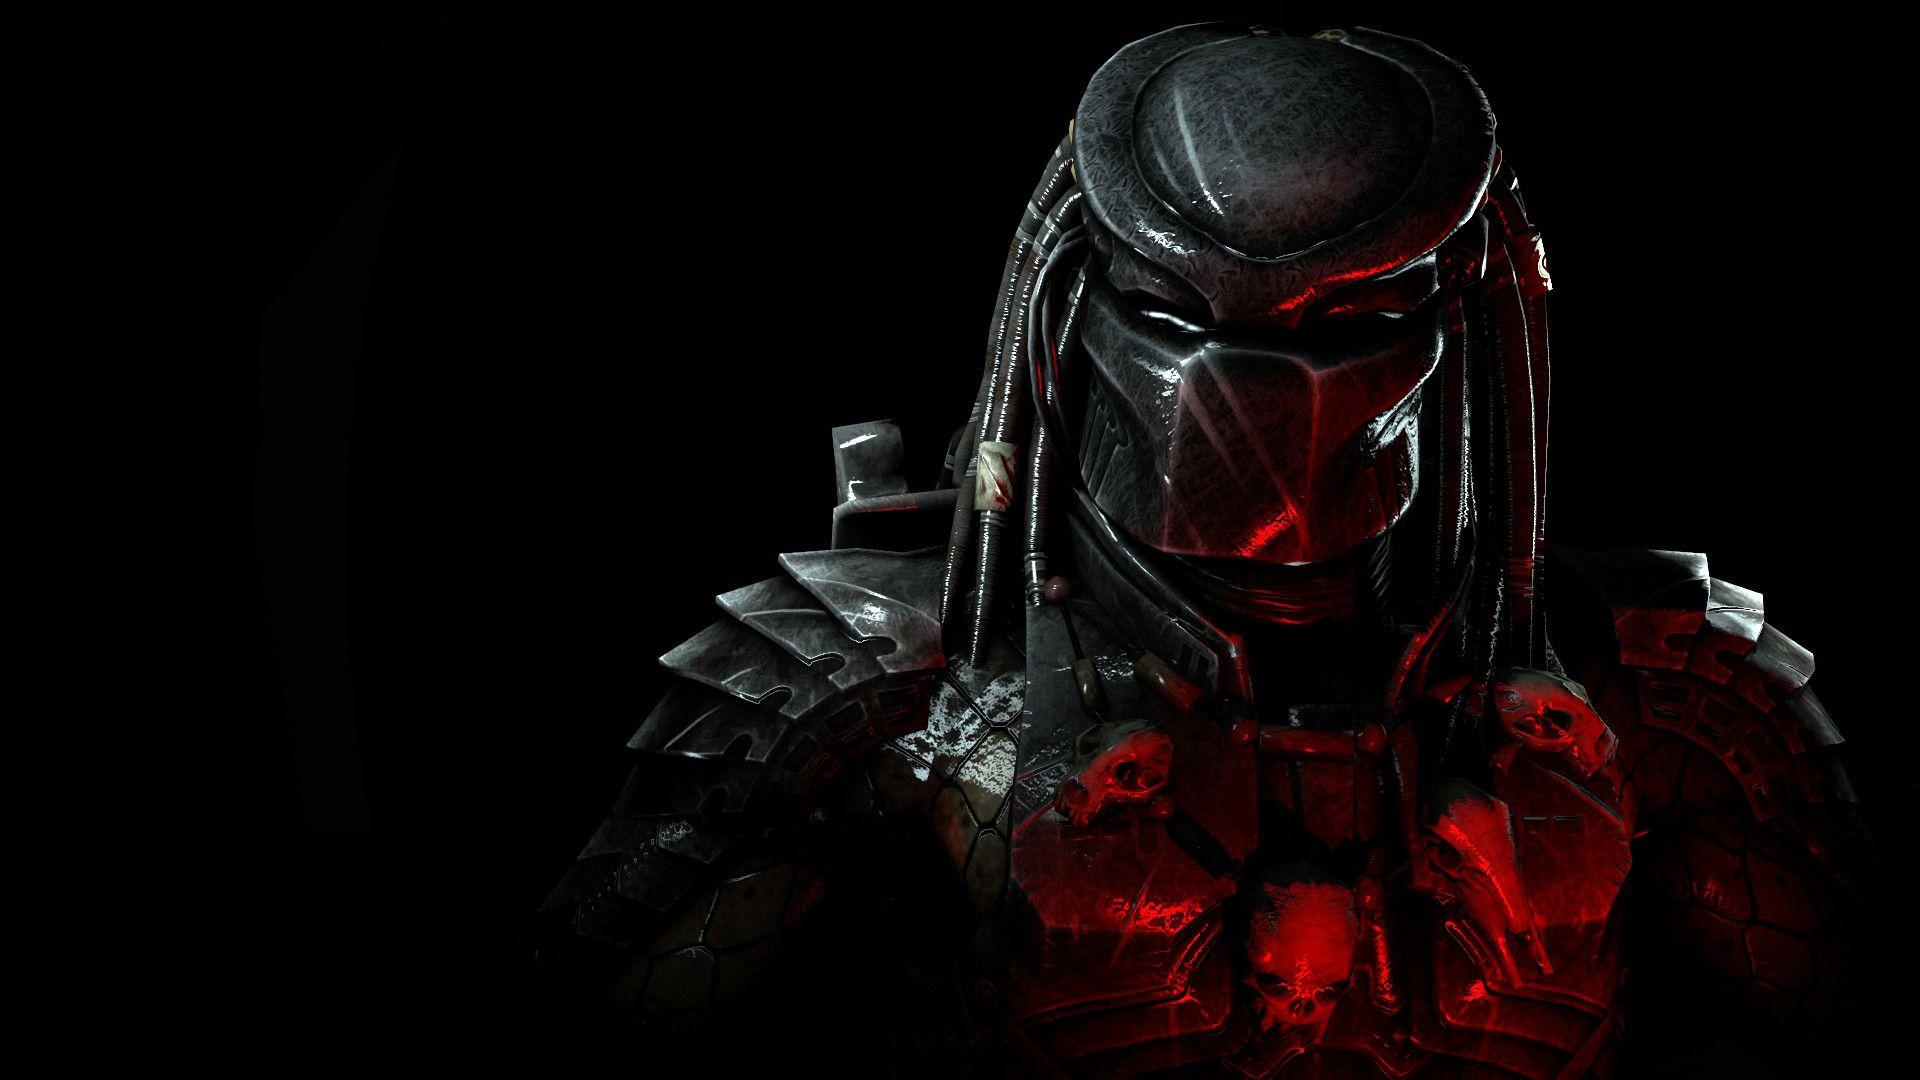 Aliens Vs Predator HD Desktop Wallpaper : Widescreen